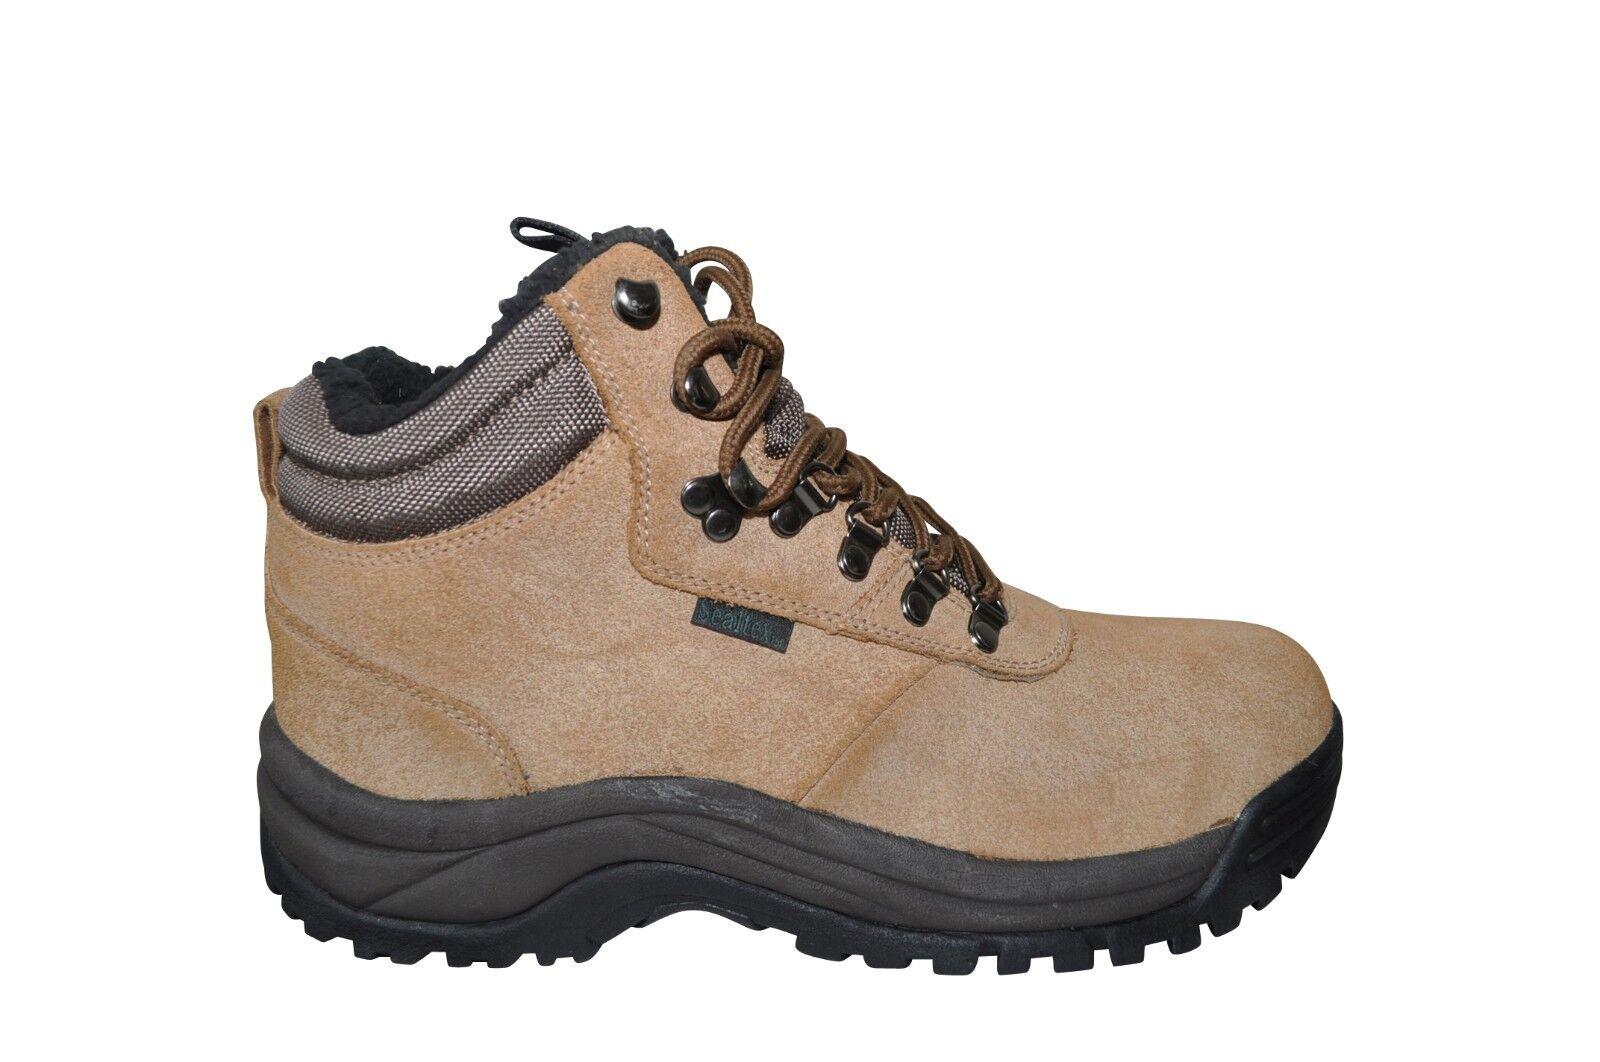 PROPET Cliff Walker ll Hiking Boots Waterproof Sealtex Brown Sharki 8 M